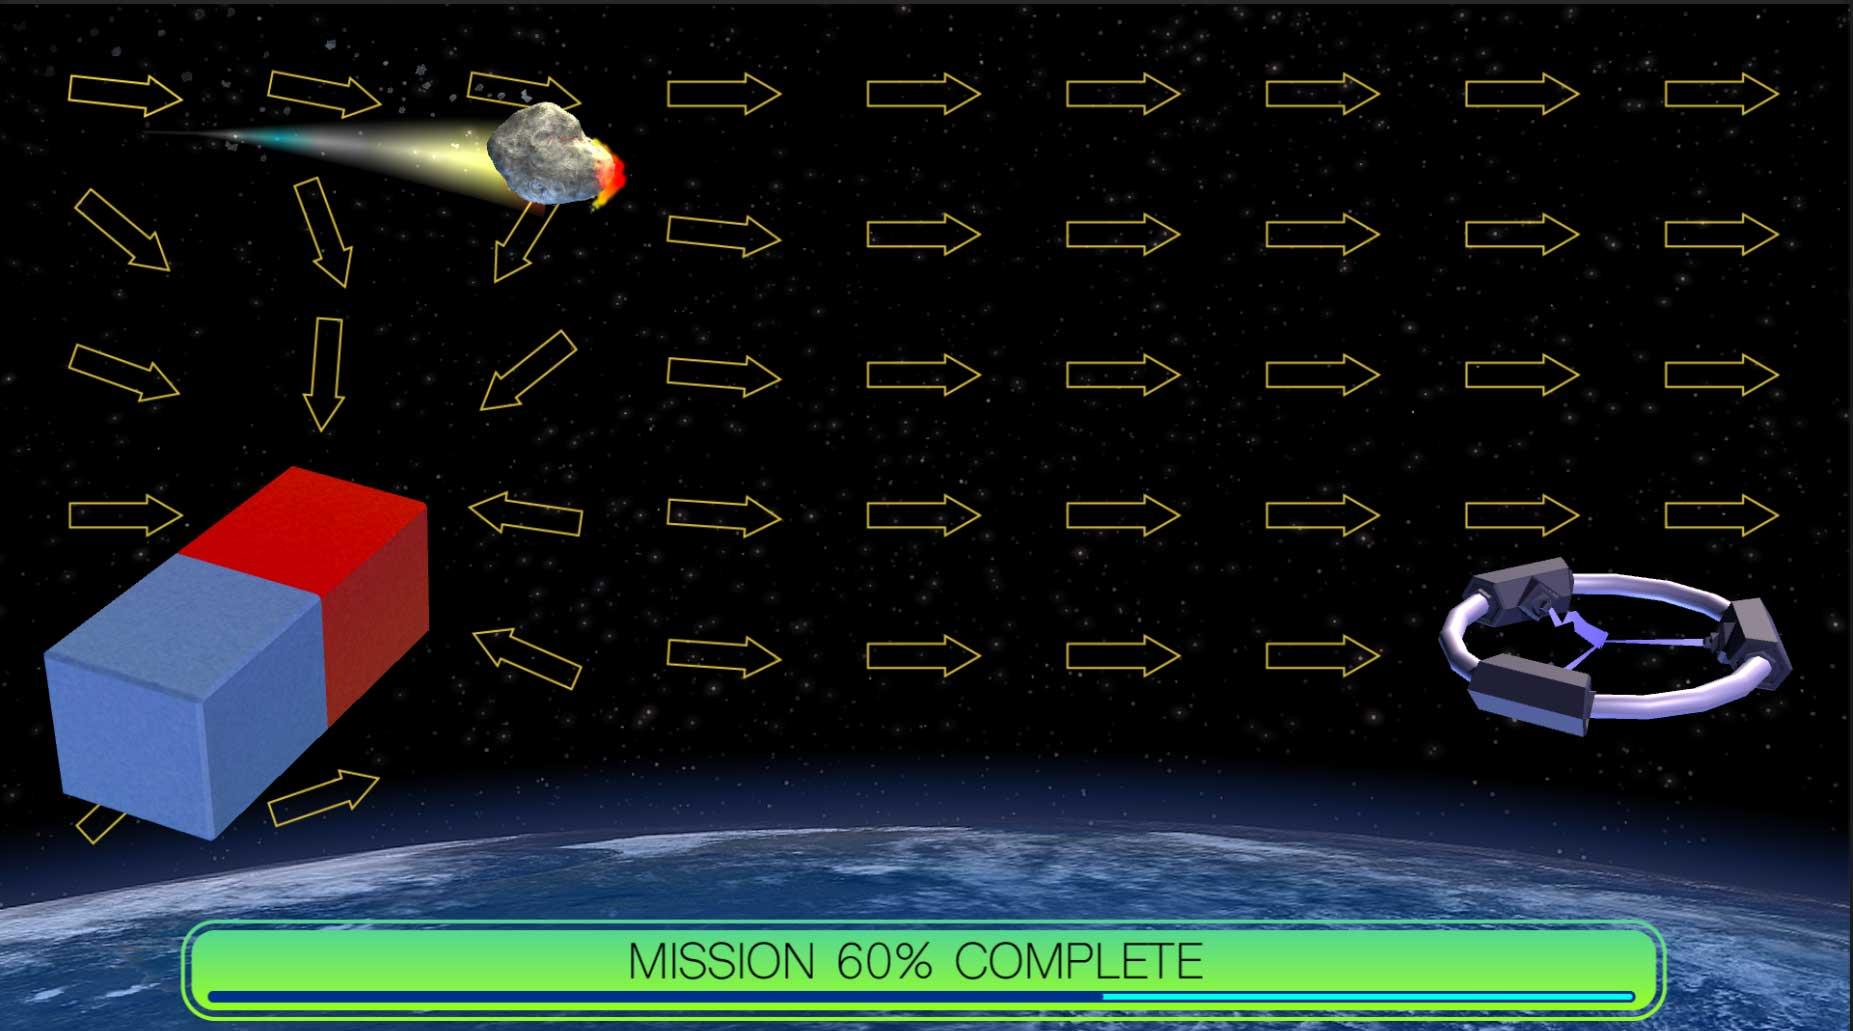 Asteroid disposal